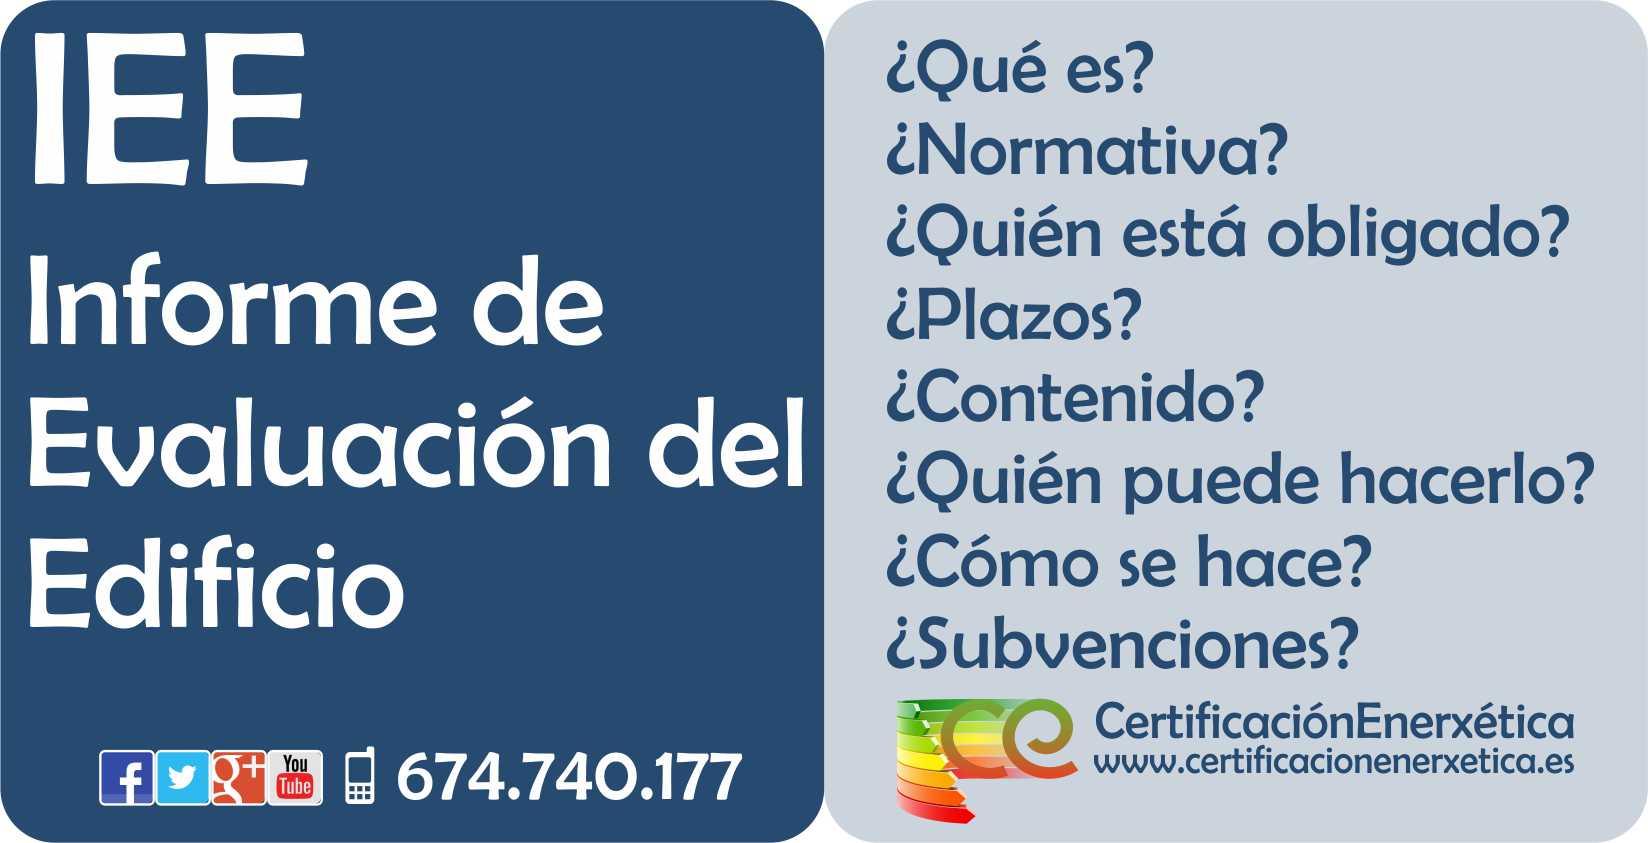 IEE A CORUÑA LUGO_CertificacionEnerxetica